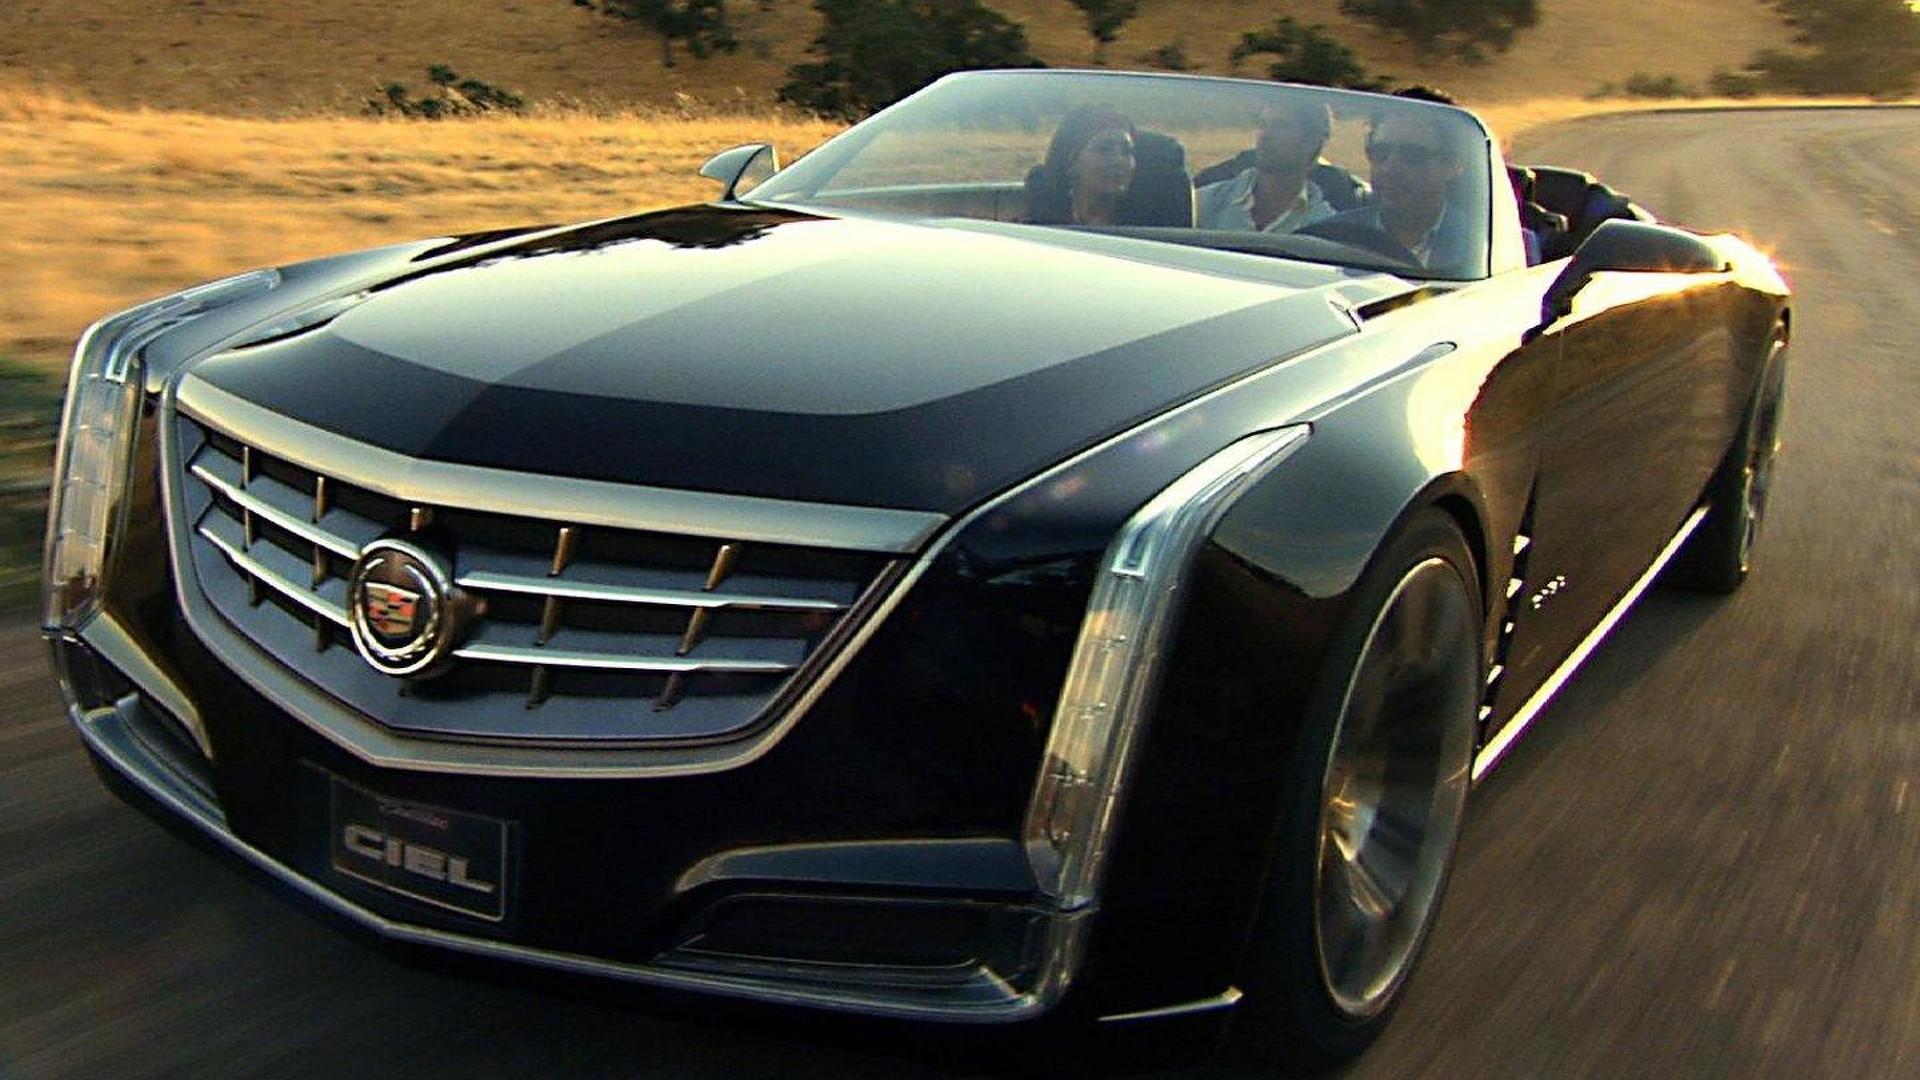 Cadillac Ciel concept returns in the Entourage movie video